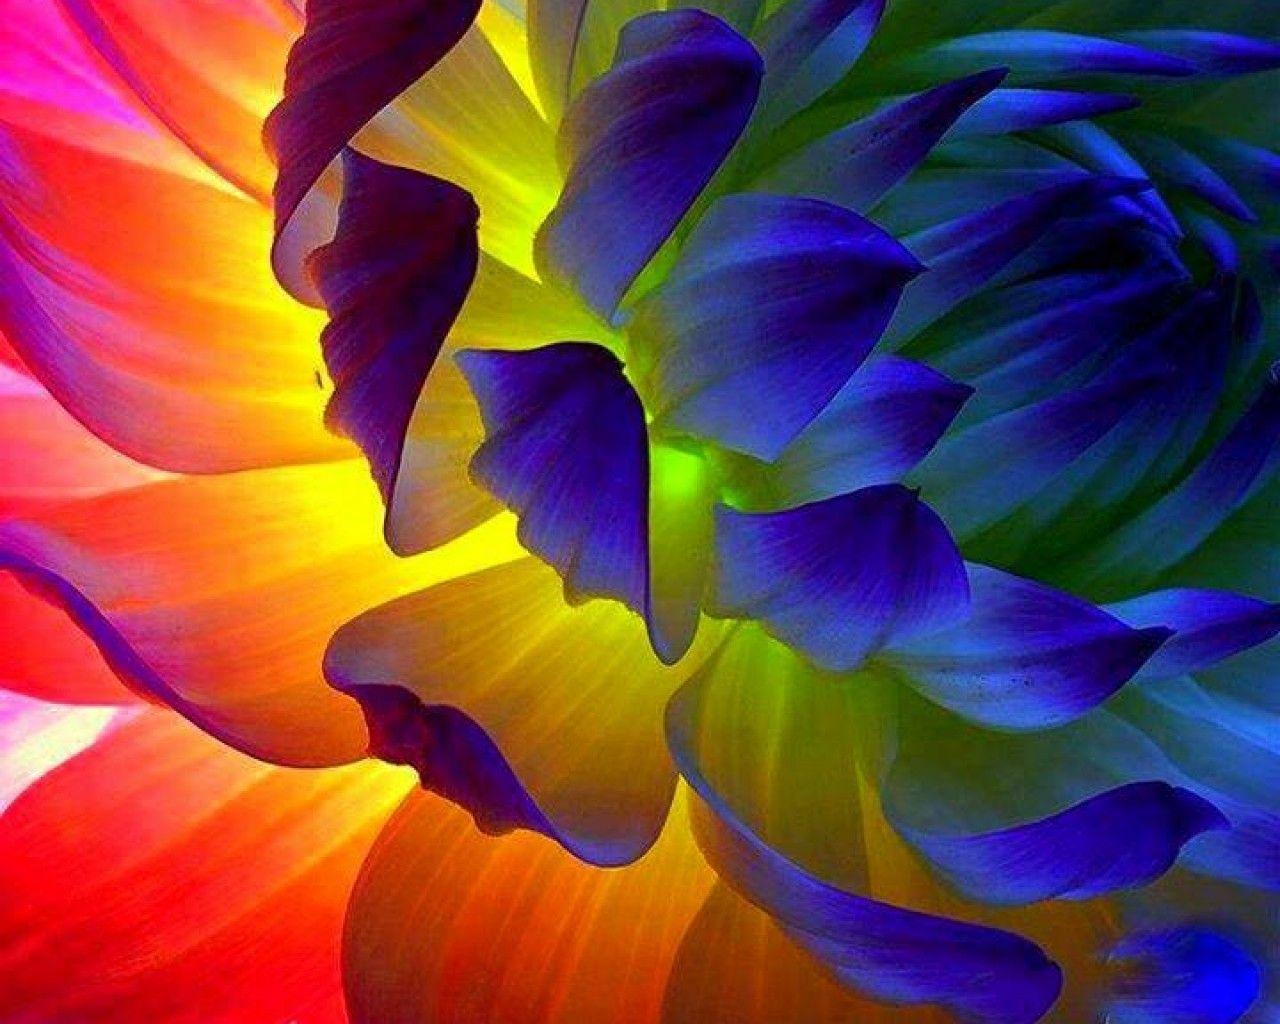 Colour Grains Colours Rainbow Dengan Gambar Wallpaper Iphone